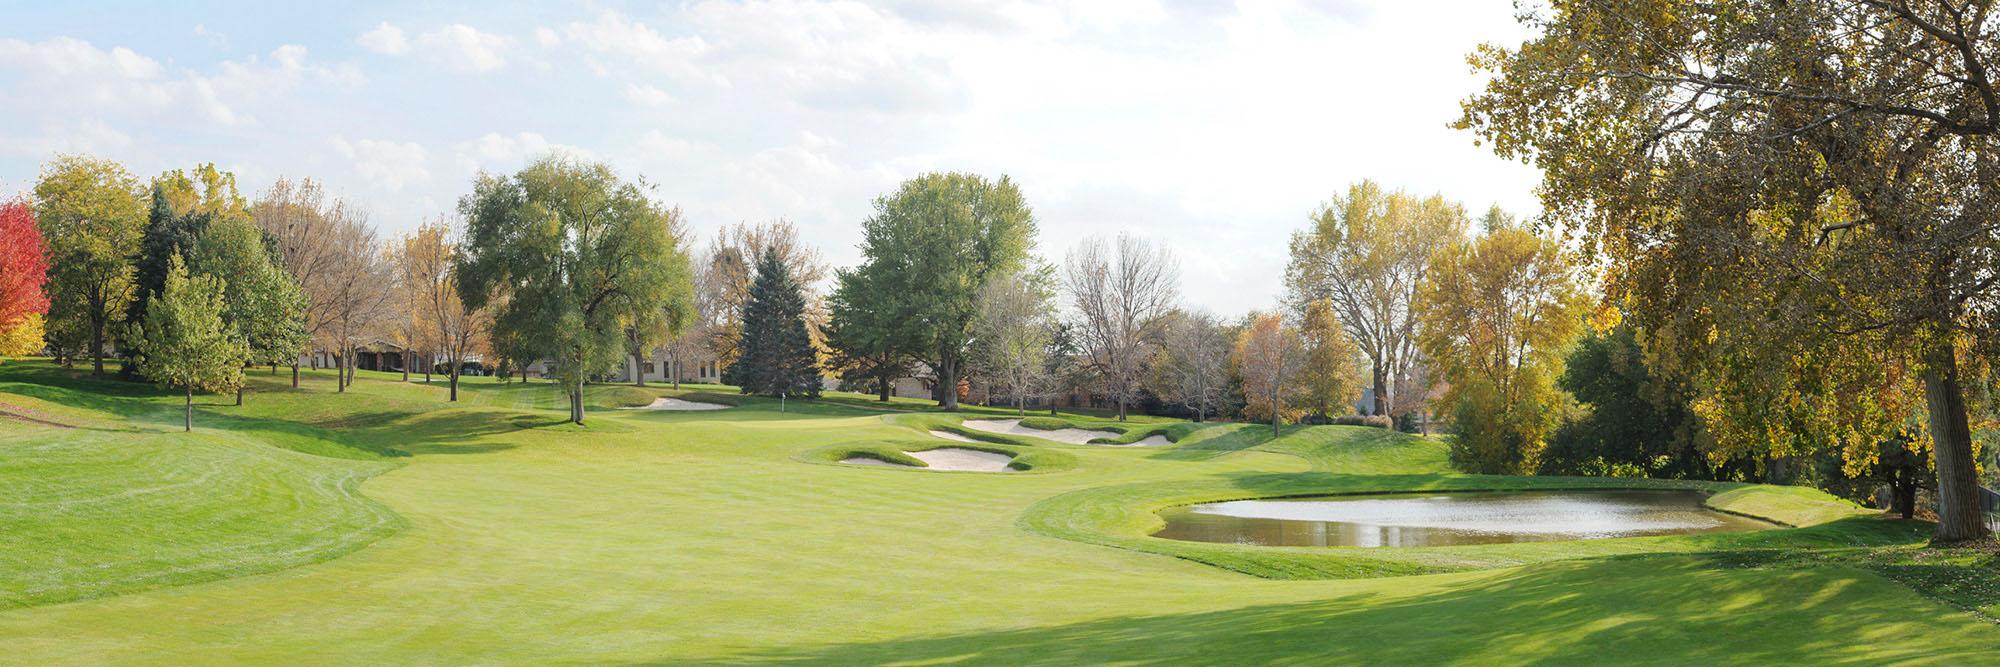 Golf Course Image - Oak Hill No. 8